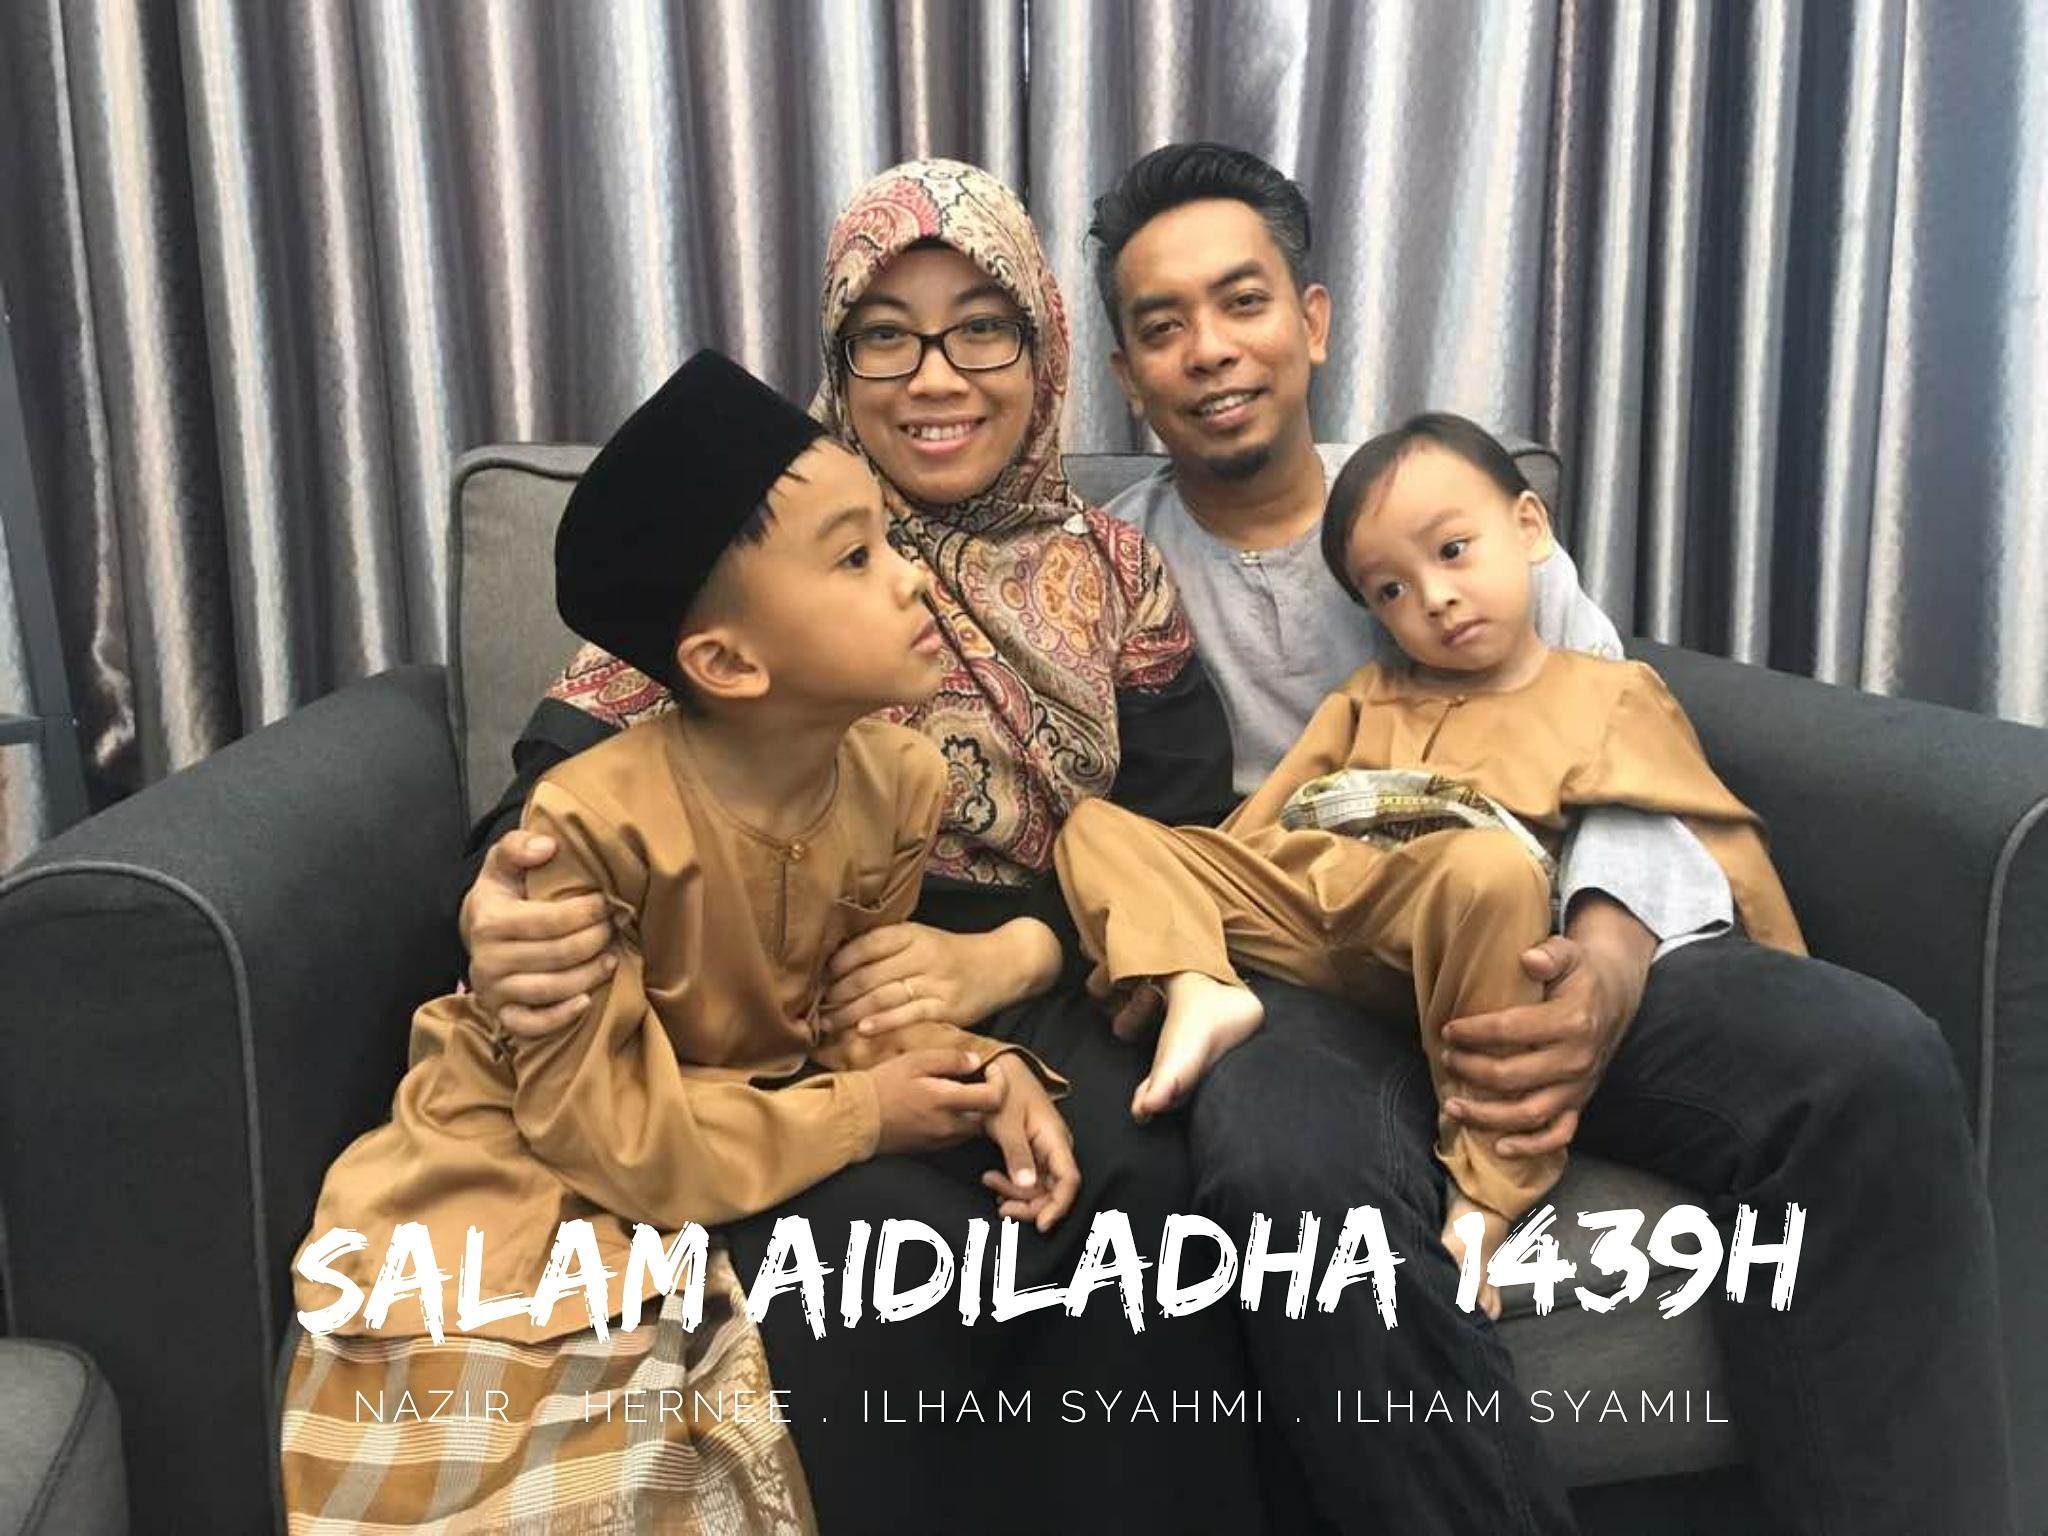 Salam Aidiladha 1439H